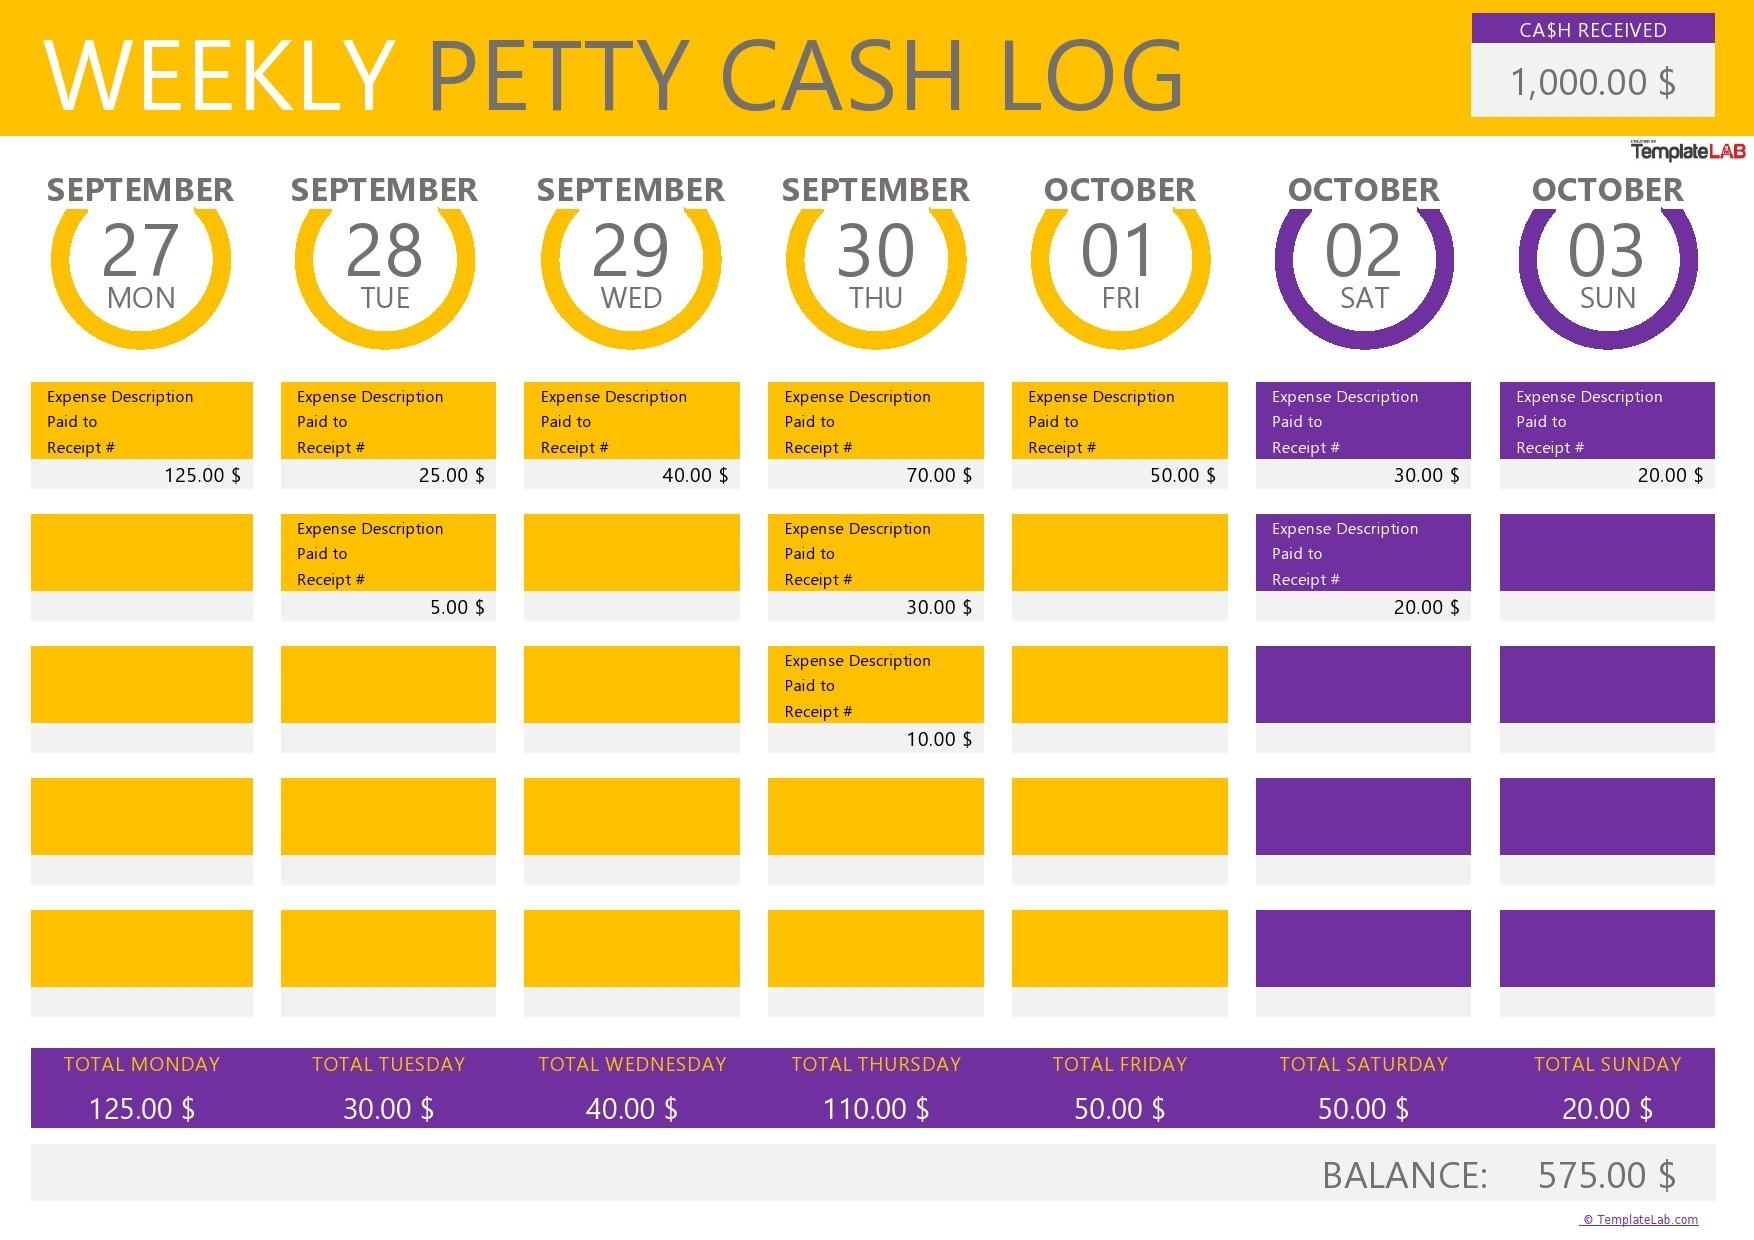 Free Weekly Petty Cash Log Template - TemplateLab.com